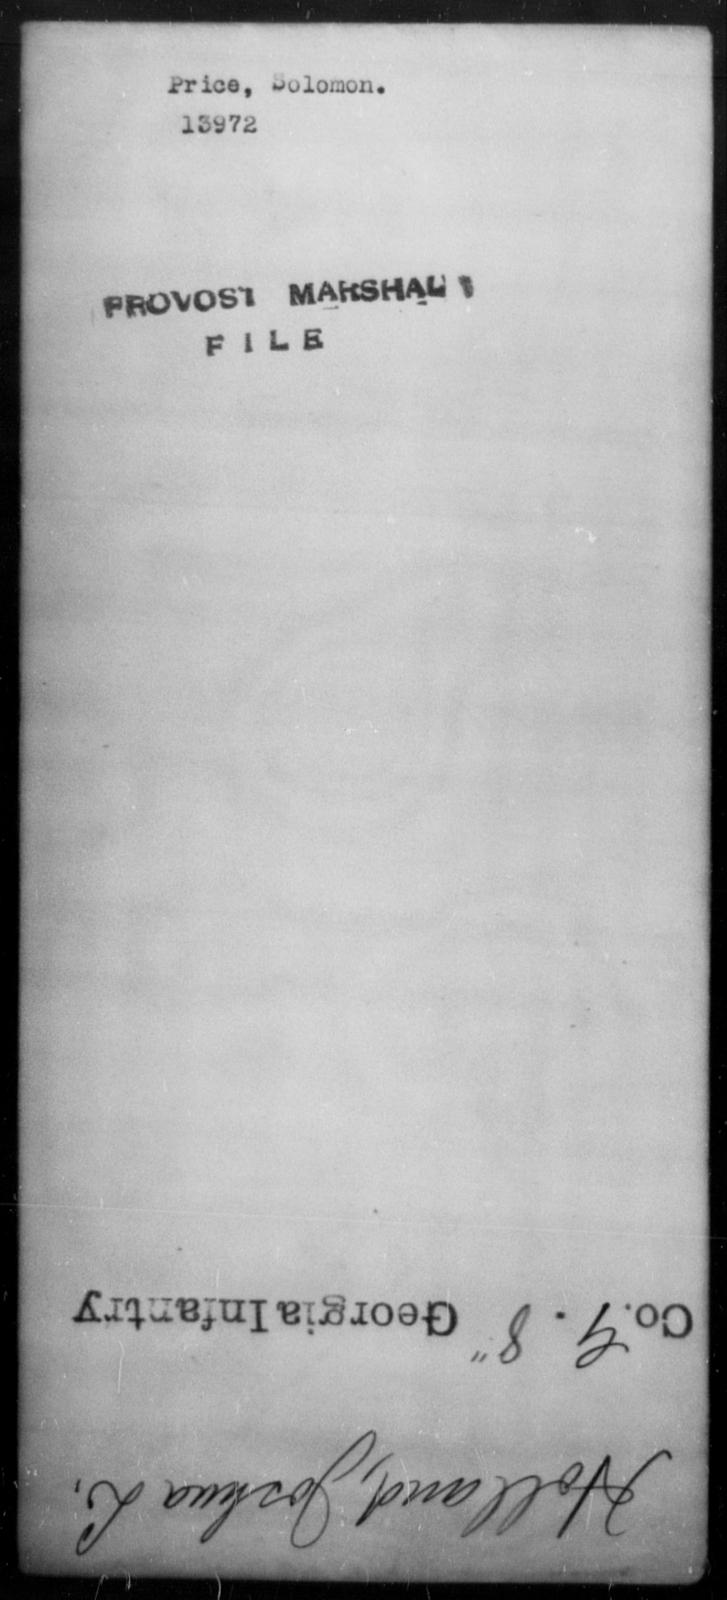 Price, Solomon - State: [Blank] - Year: [Blank]